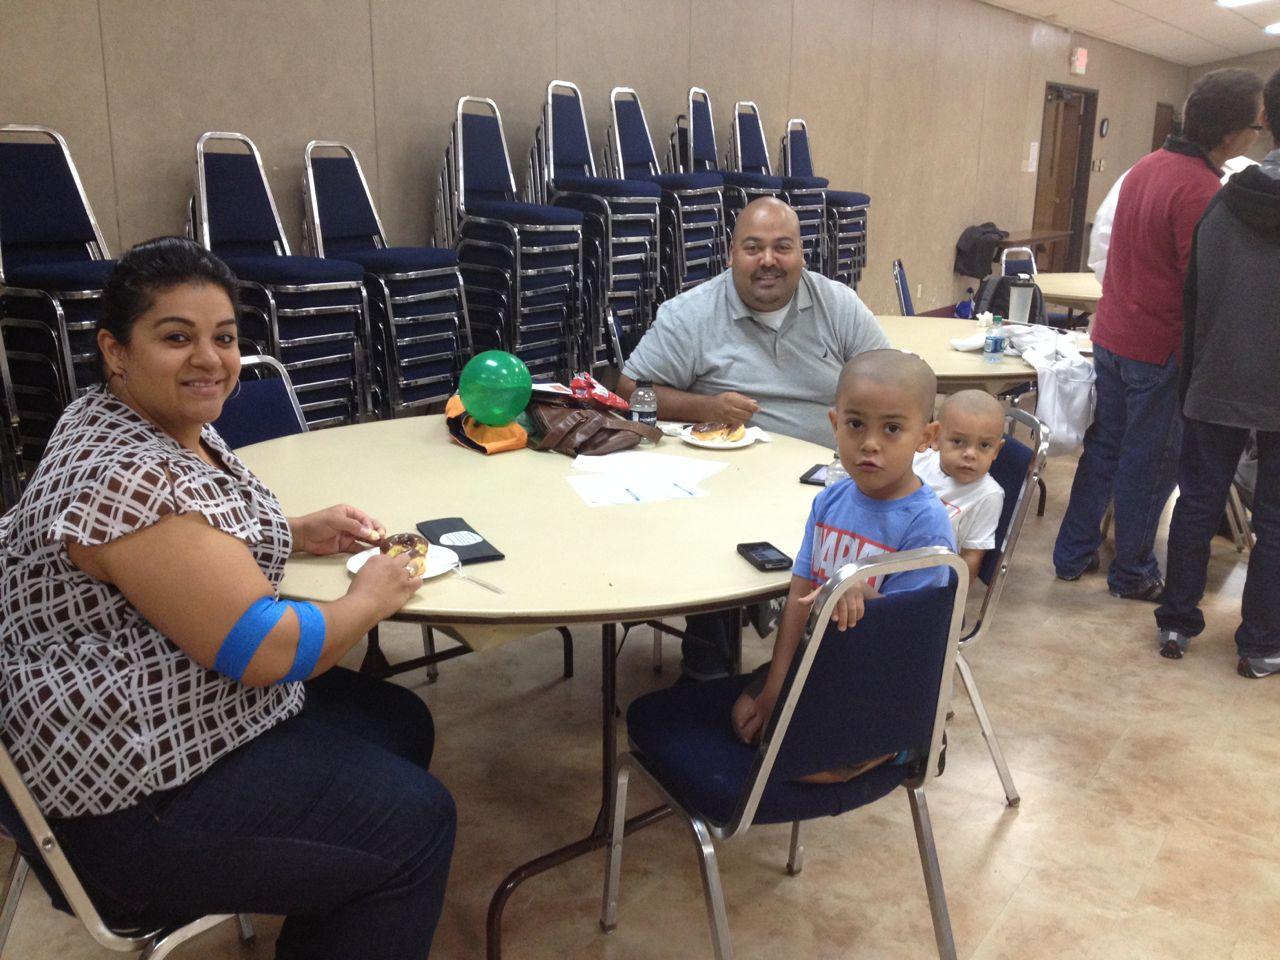 Miguel and Darlene Hernandez with David and Benjamin